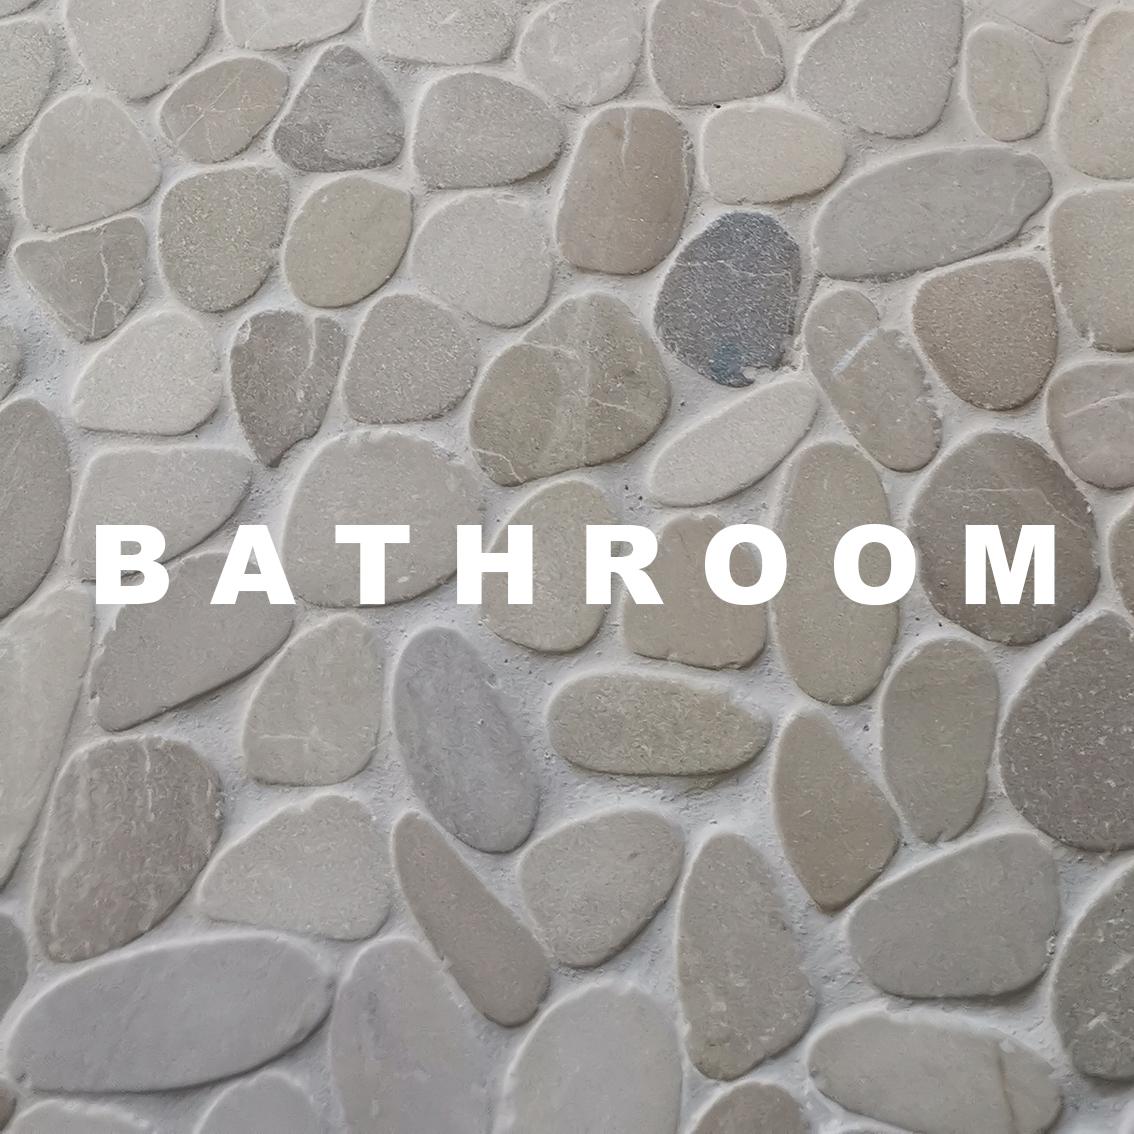 bathroomnew.jpg